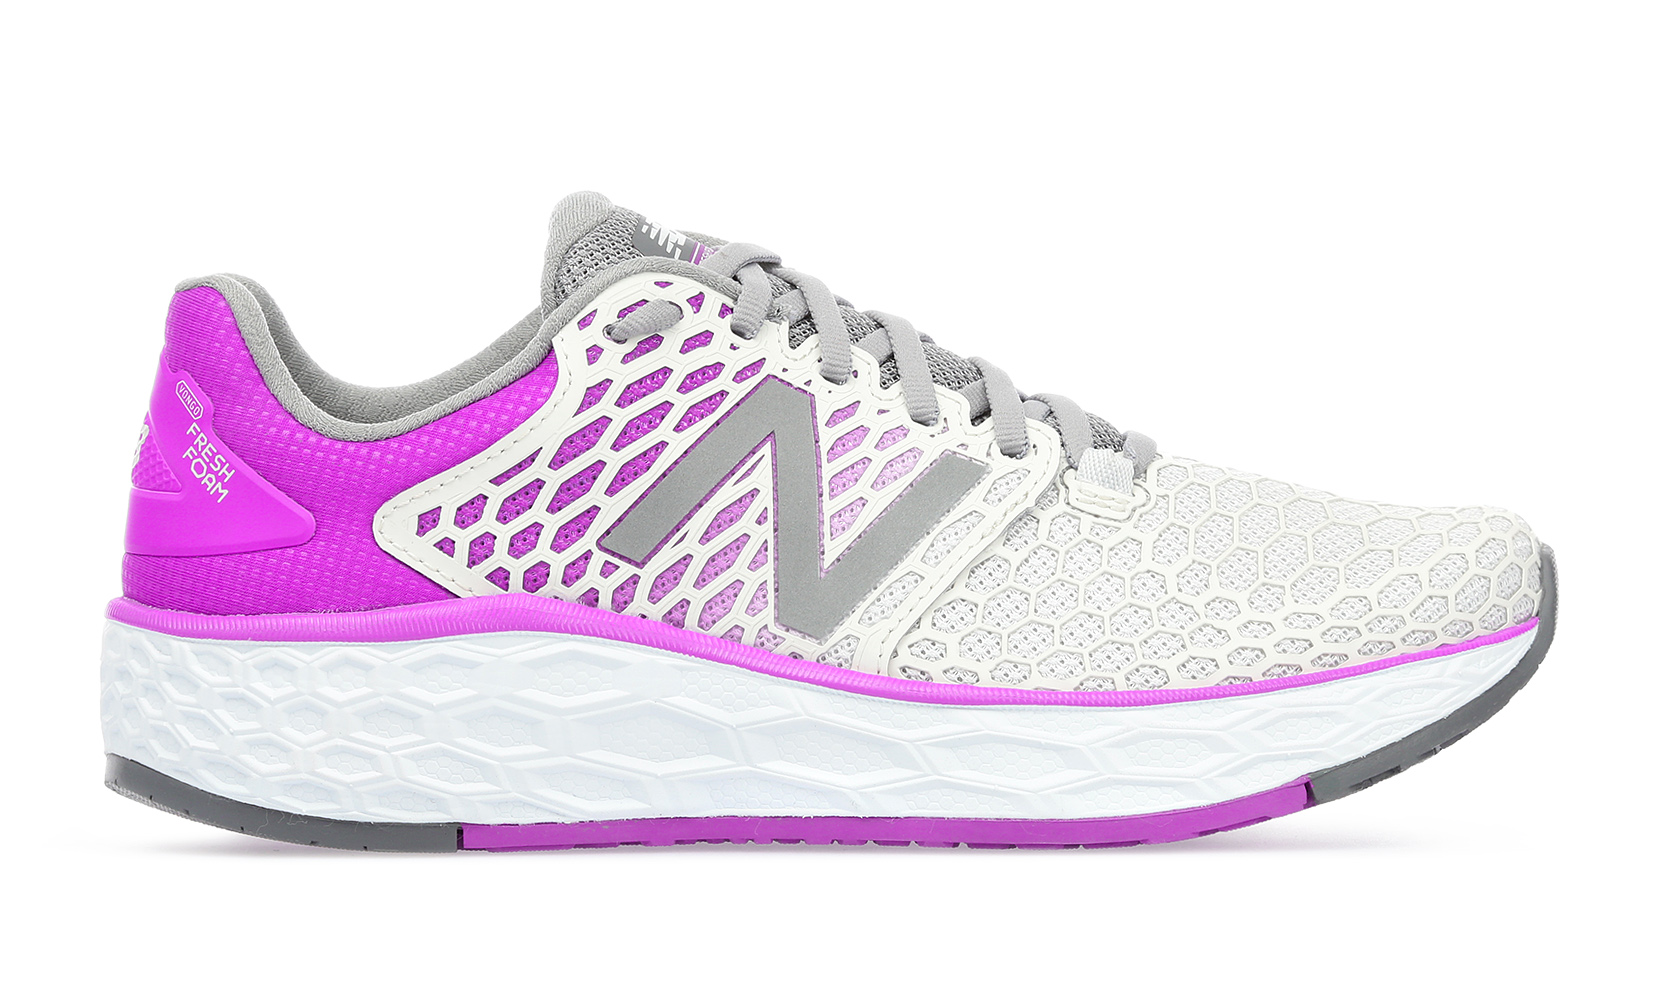 Жіноче взуття для бігу New Balance Fresh Foam Vongo v3 WVNGOGV3 | New Balance